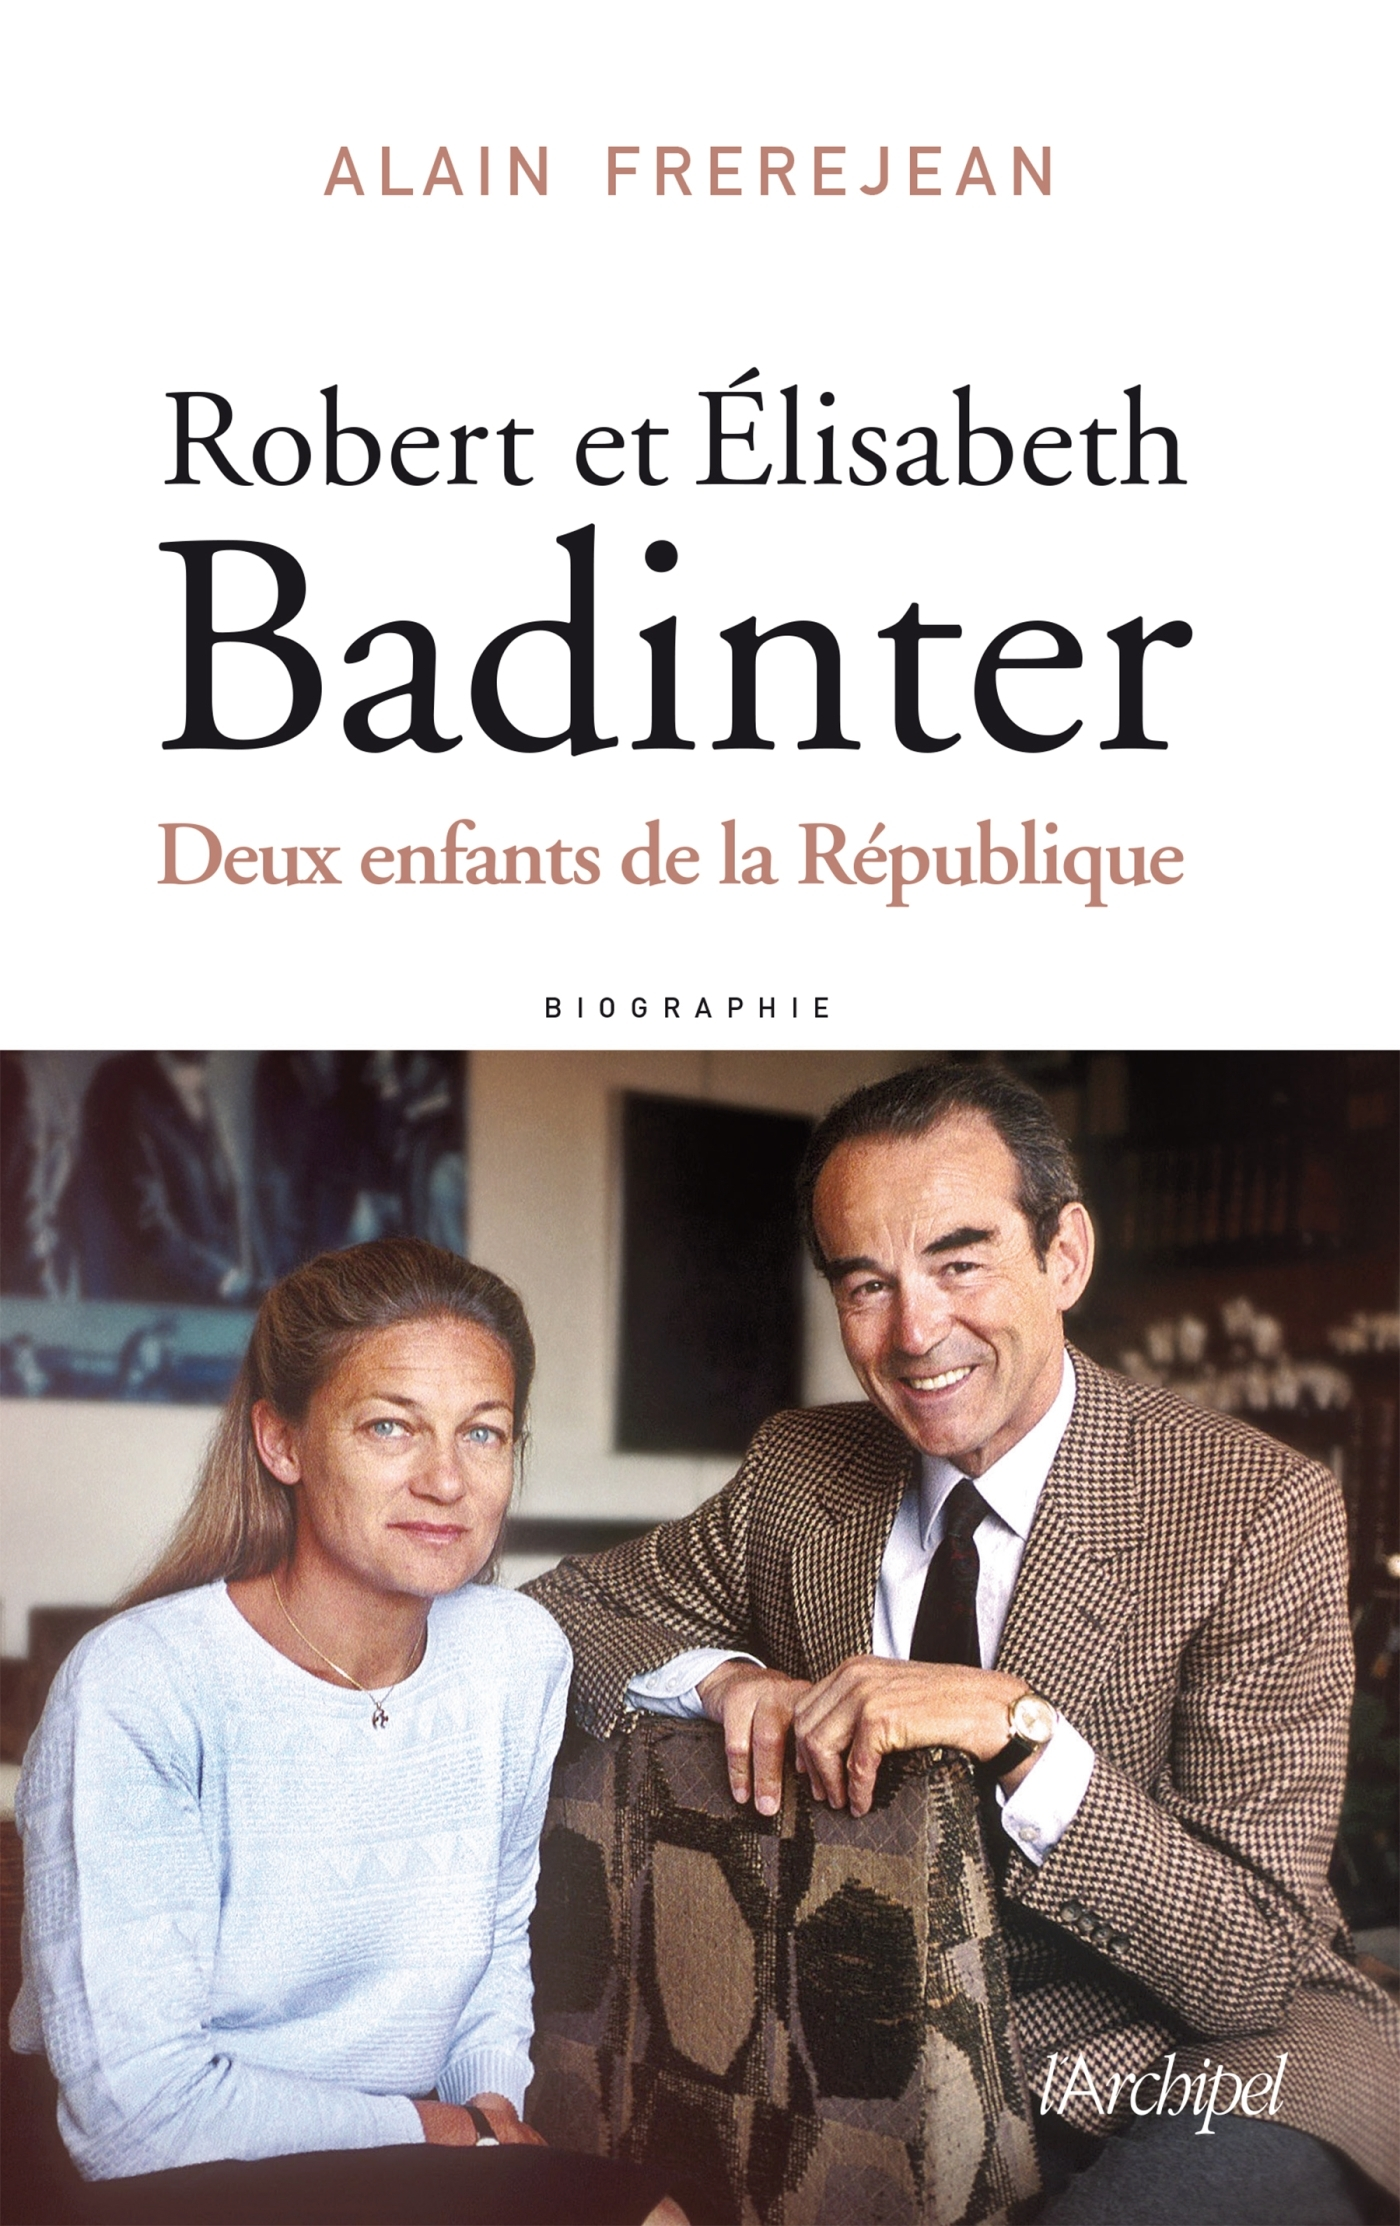 ROBERT ET ELISABETH BADINTER